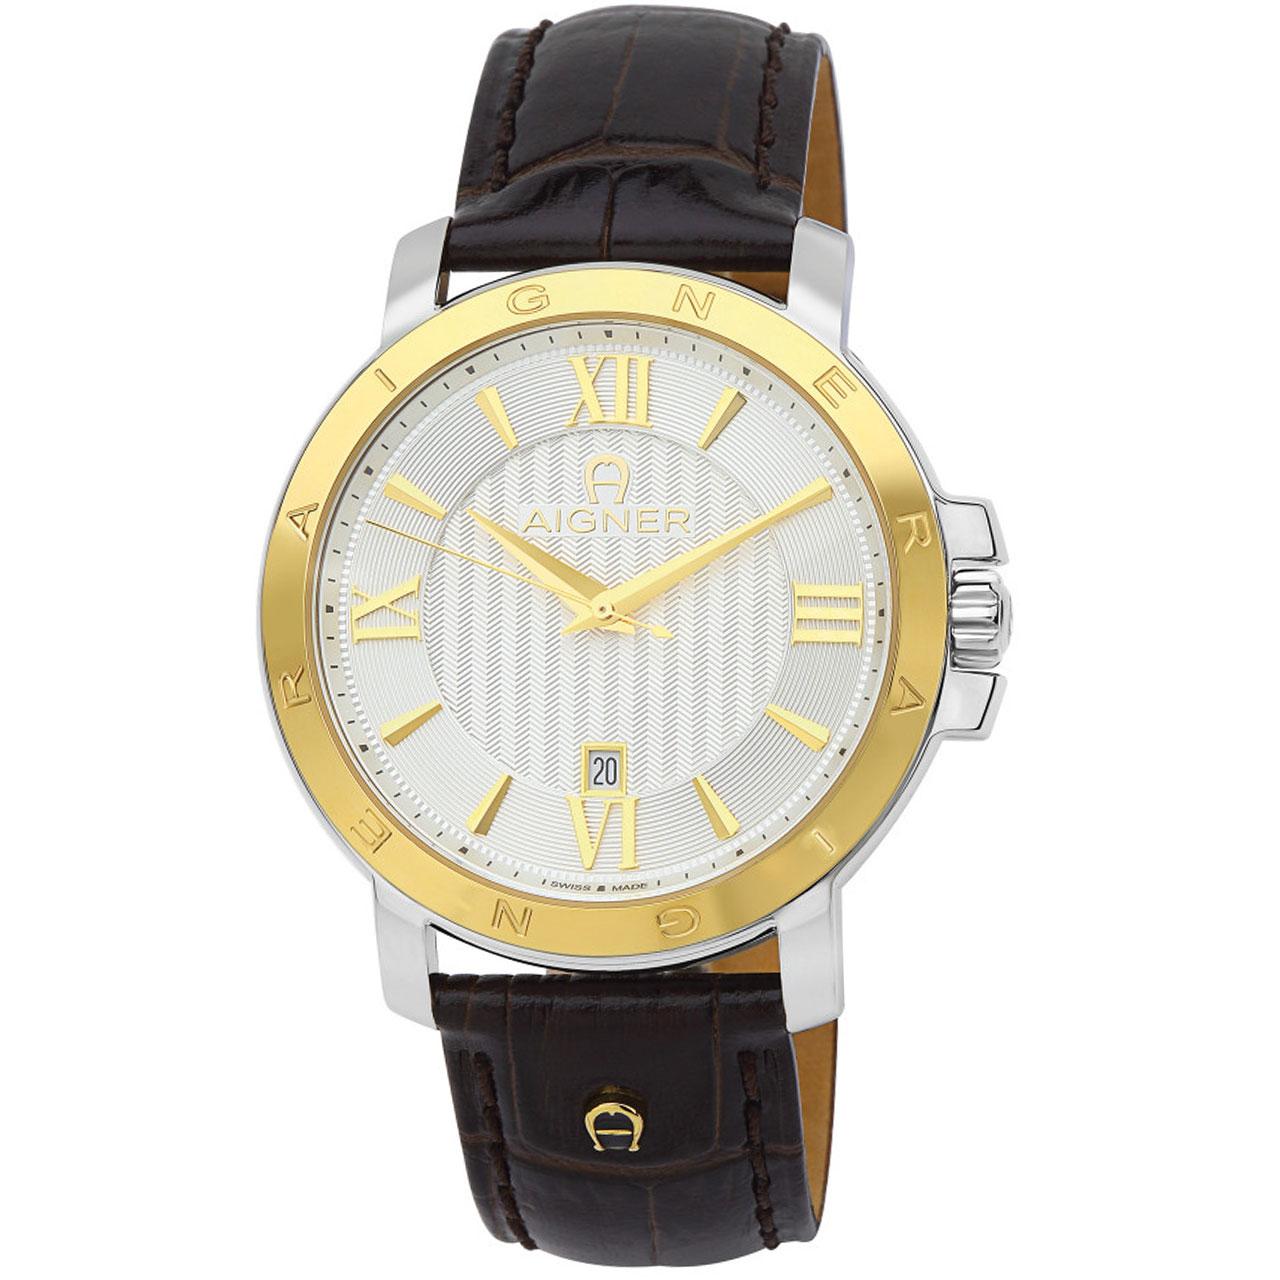 ساعت مچی عقربه ای مردانه اگنر مدل A09011